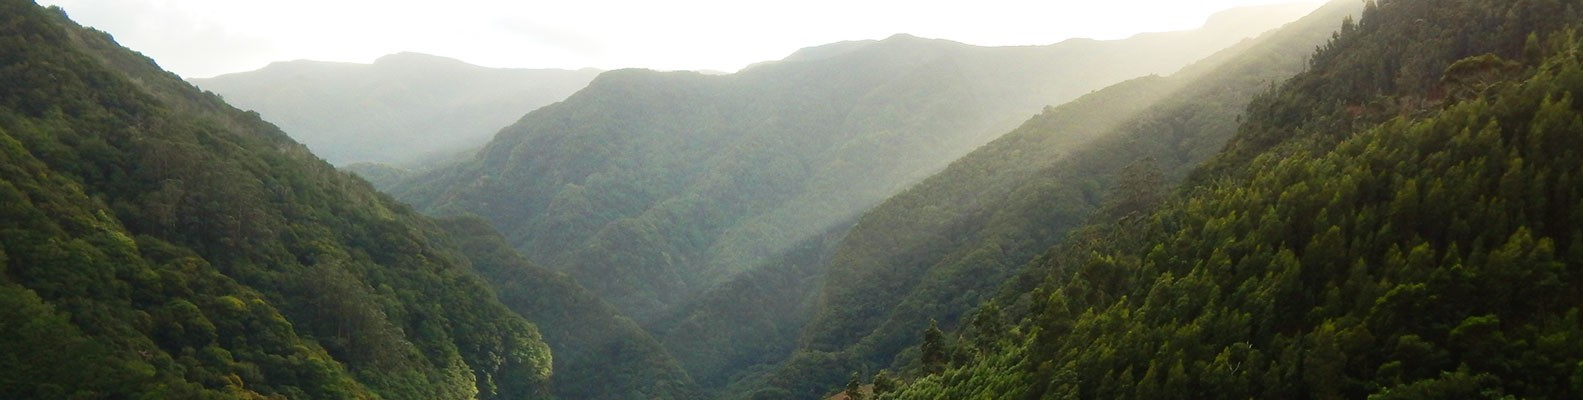 History of Madeira Island